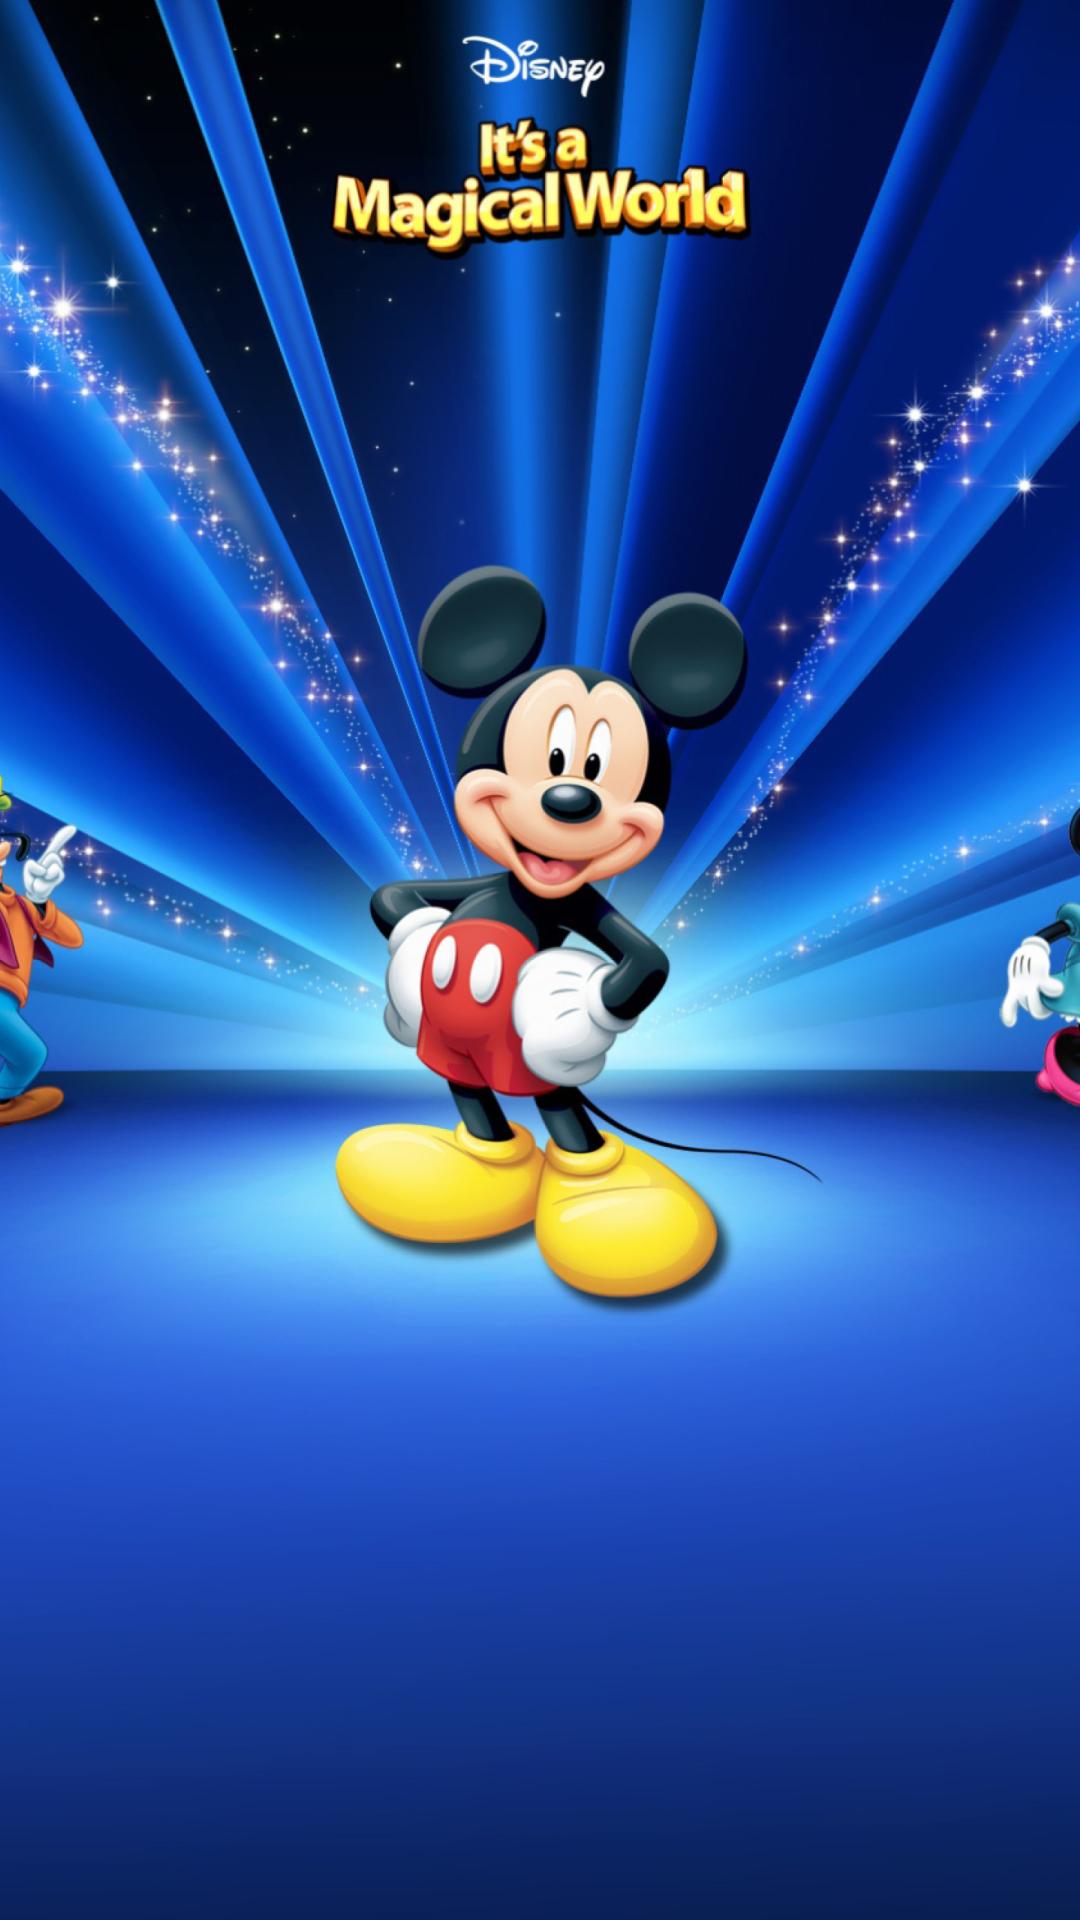 Cute Cartoon Wallpaper For Iphone 6 Disney Iphone Images Free Download Pixelstalk Net